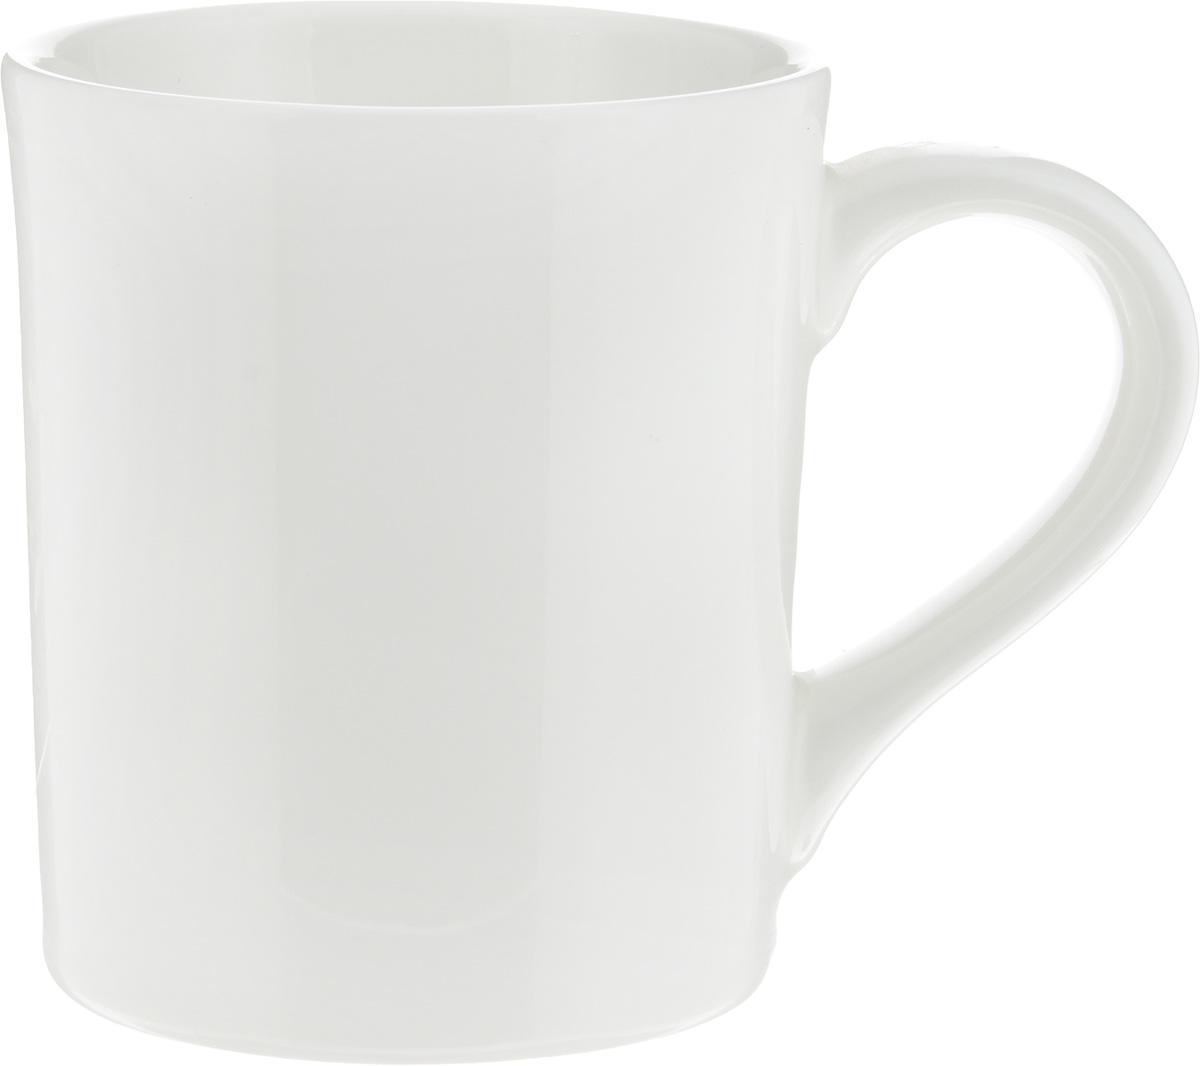 Фото - Кружка Ariane Прайм, 460 мл чашка чайная ariane прайм 230 мл